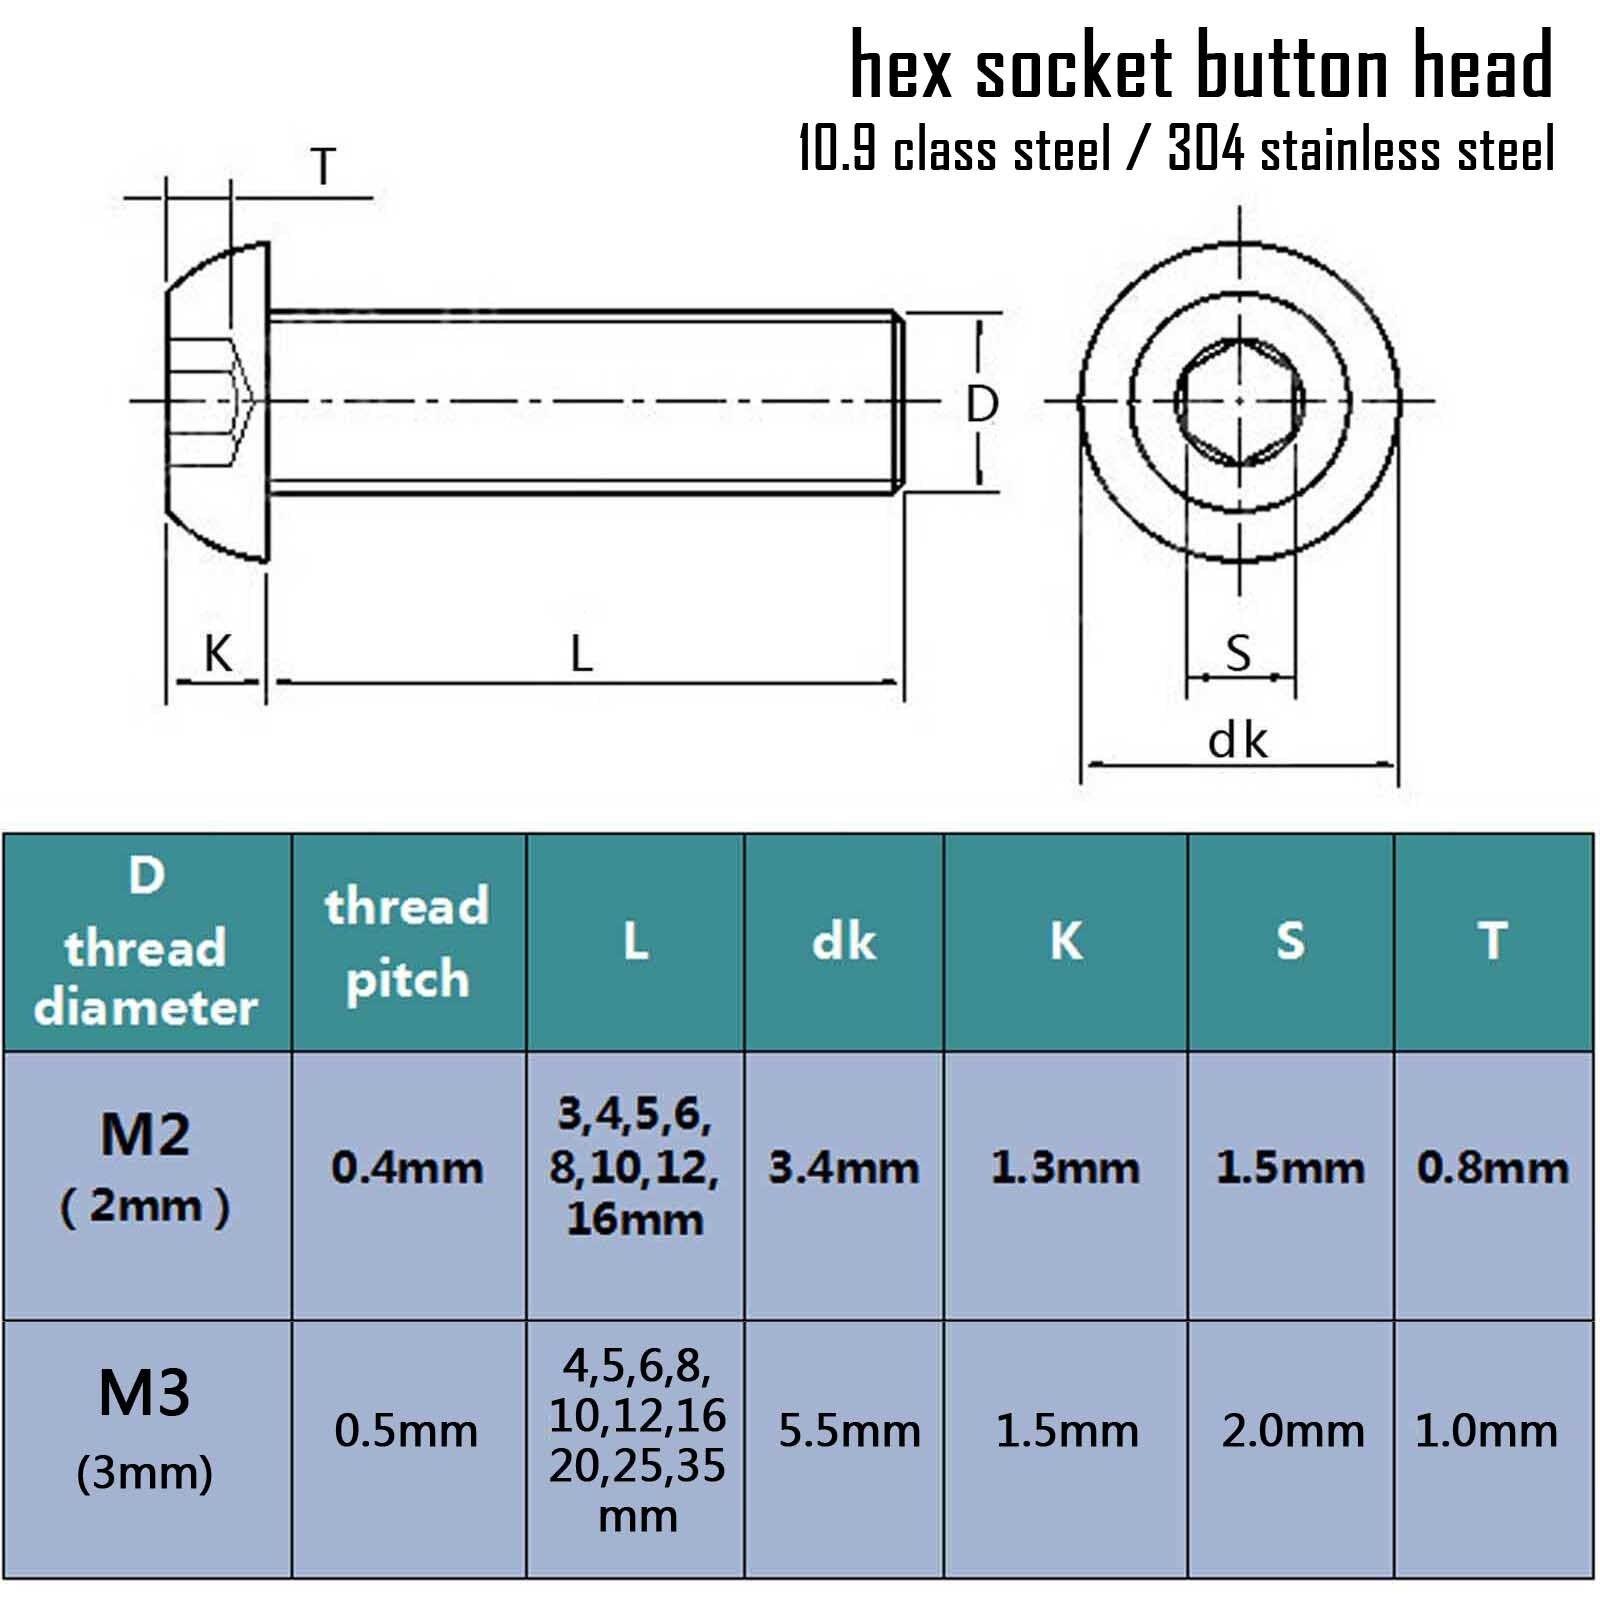 M4 4mm M5 5mm ZINC PLATED CAP HEAD SCREWS Grade10.9 SOCKET SCREWS